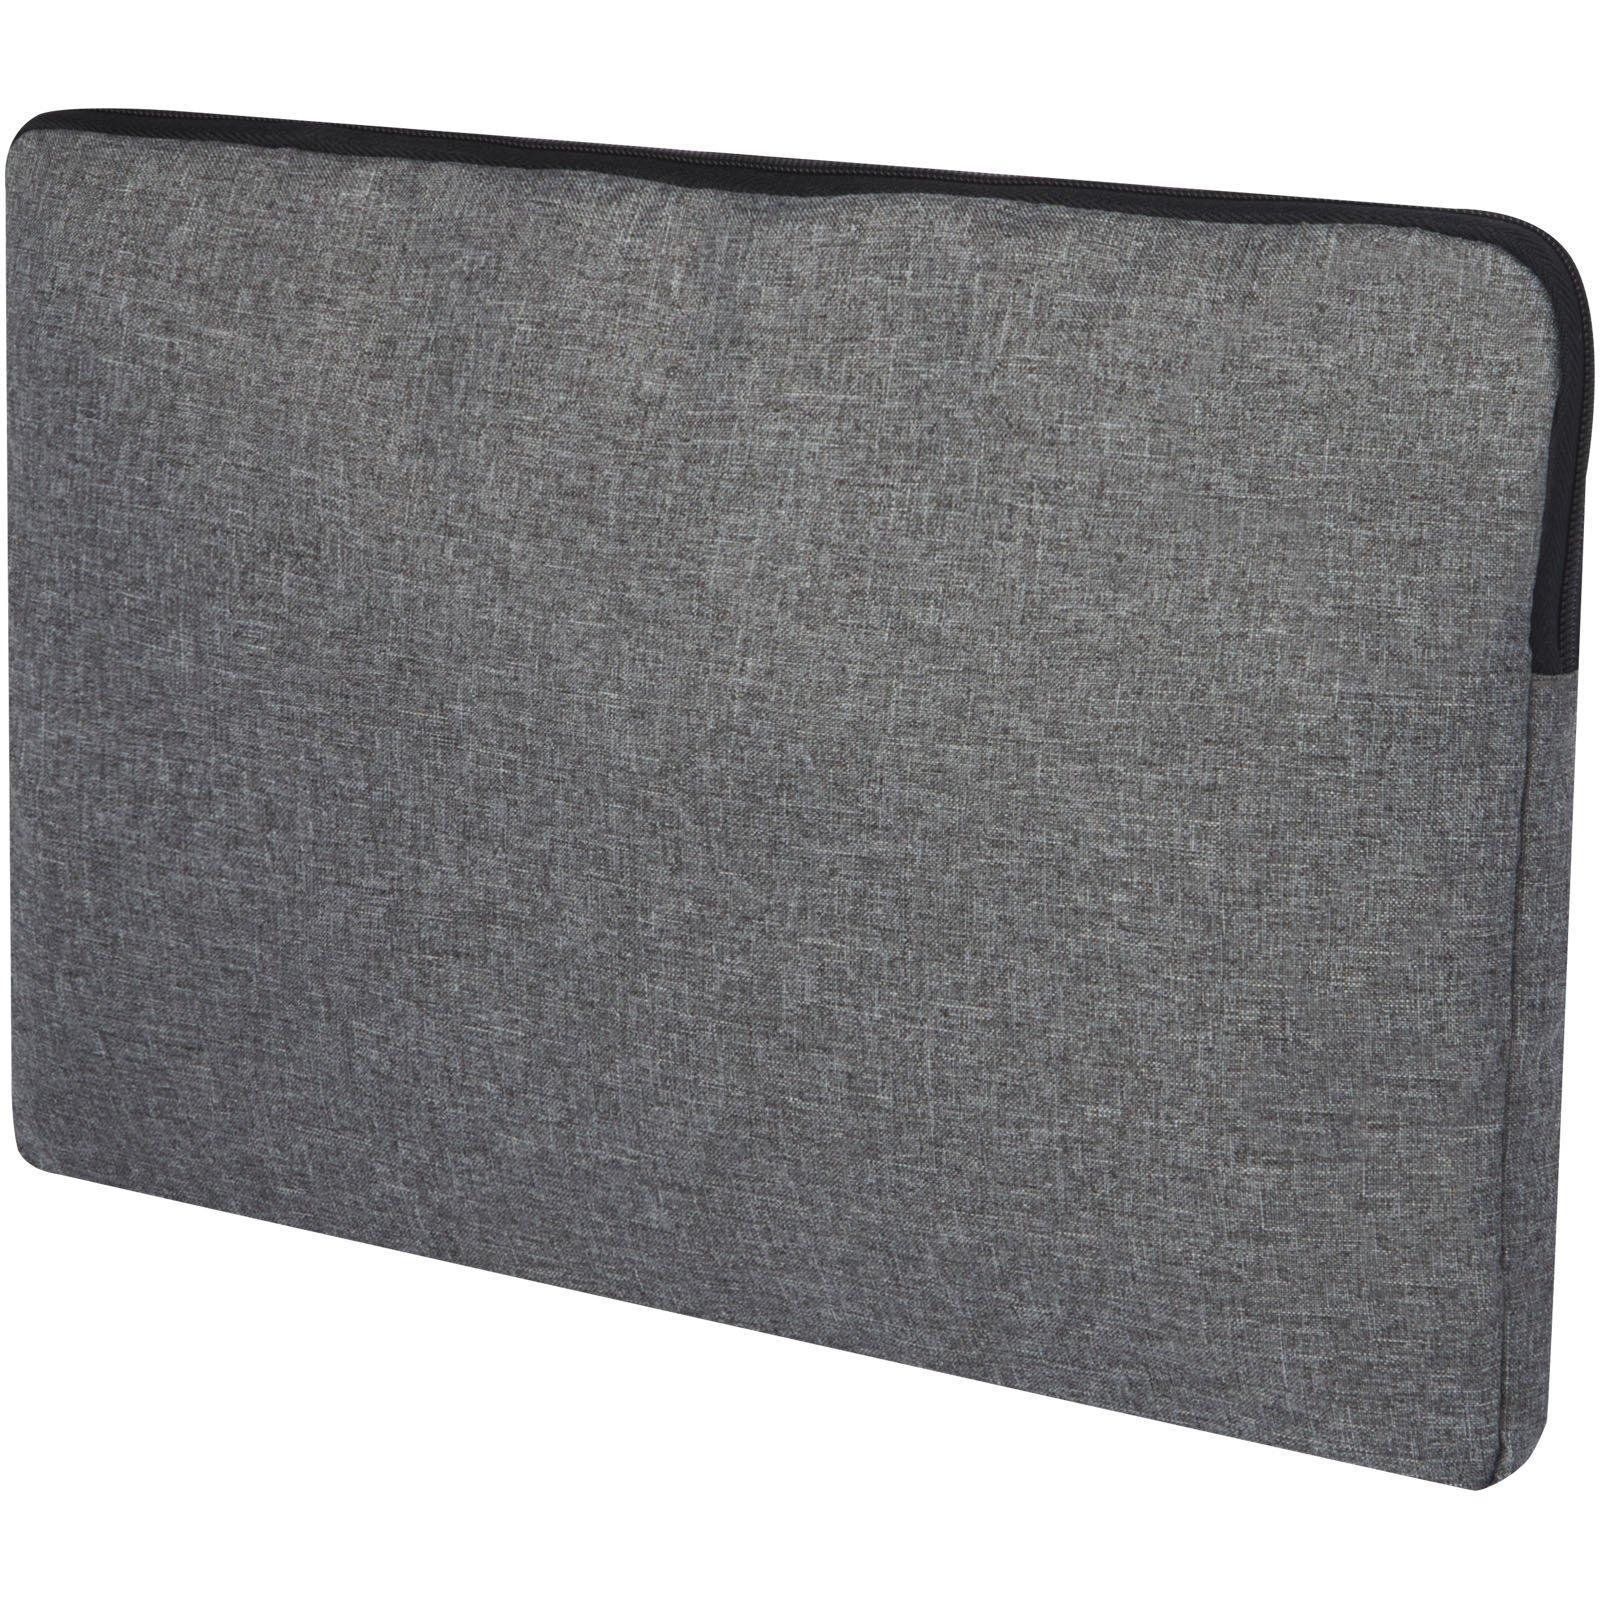 "Bullet Hoss 15"" laptop sleeve"